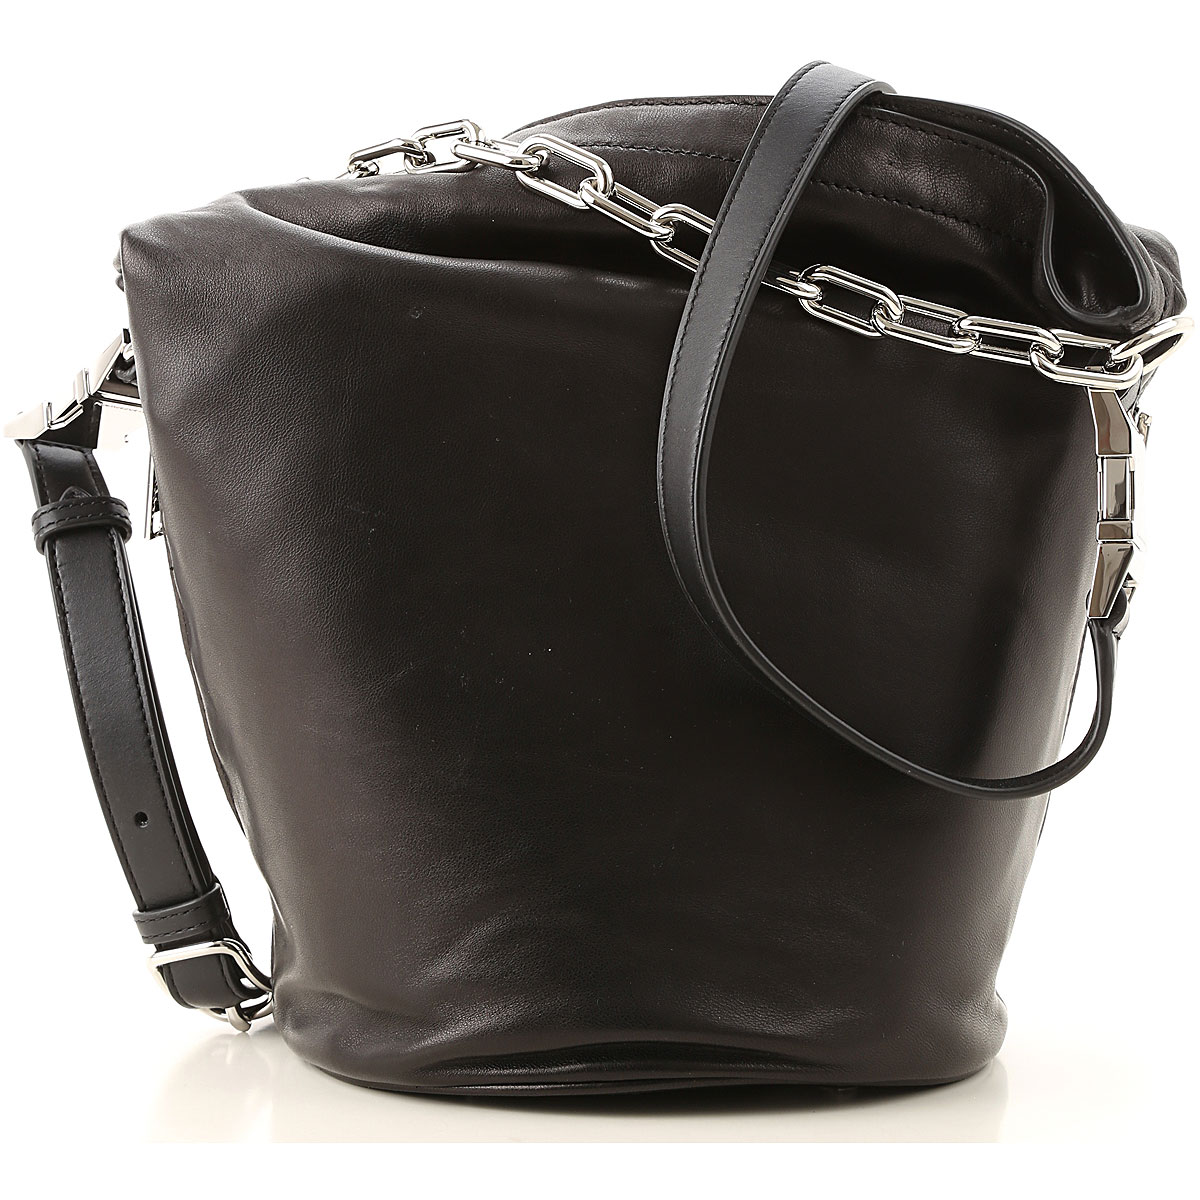 Alexander Wang Tote Bag On Sale, Black, Lamb Nappa Leather, 2019